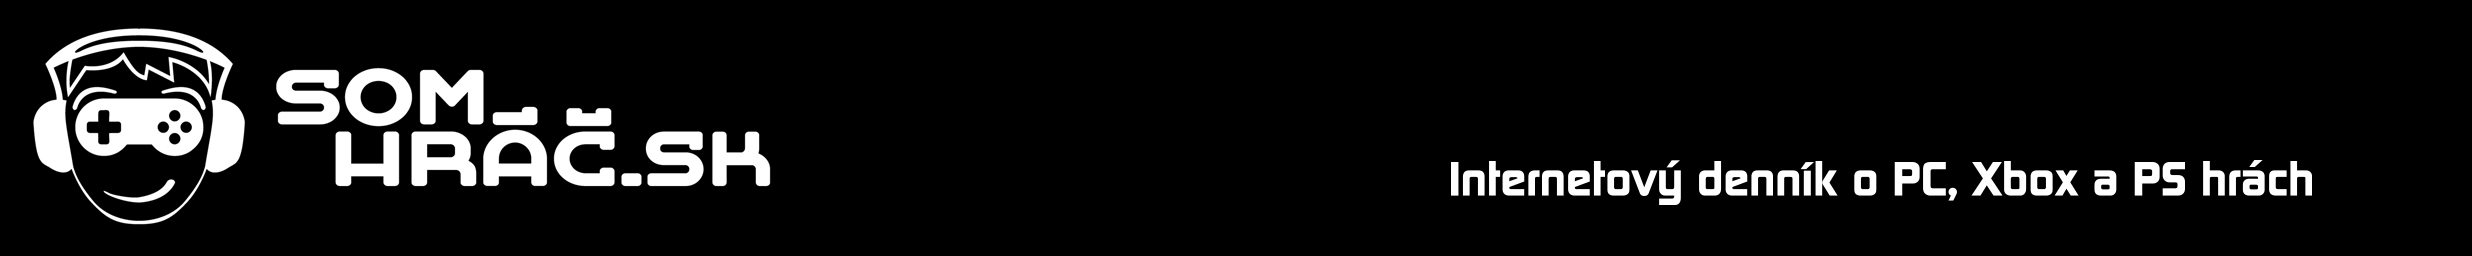 somhrac.sk logo